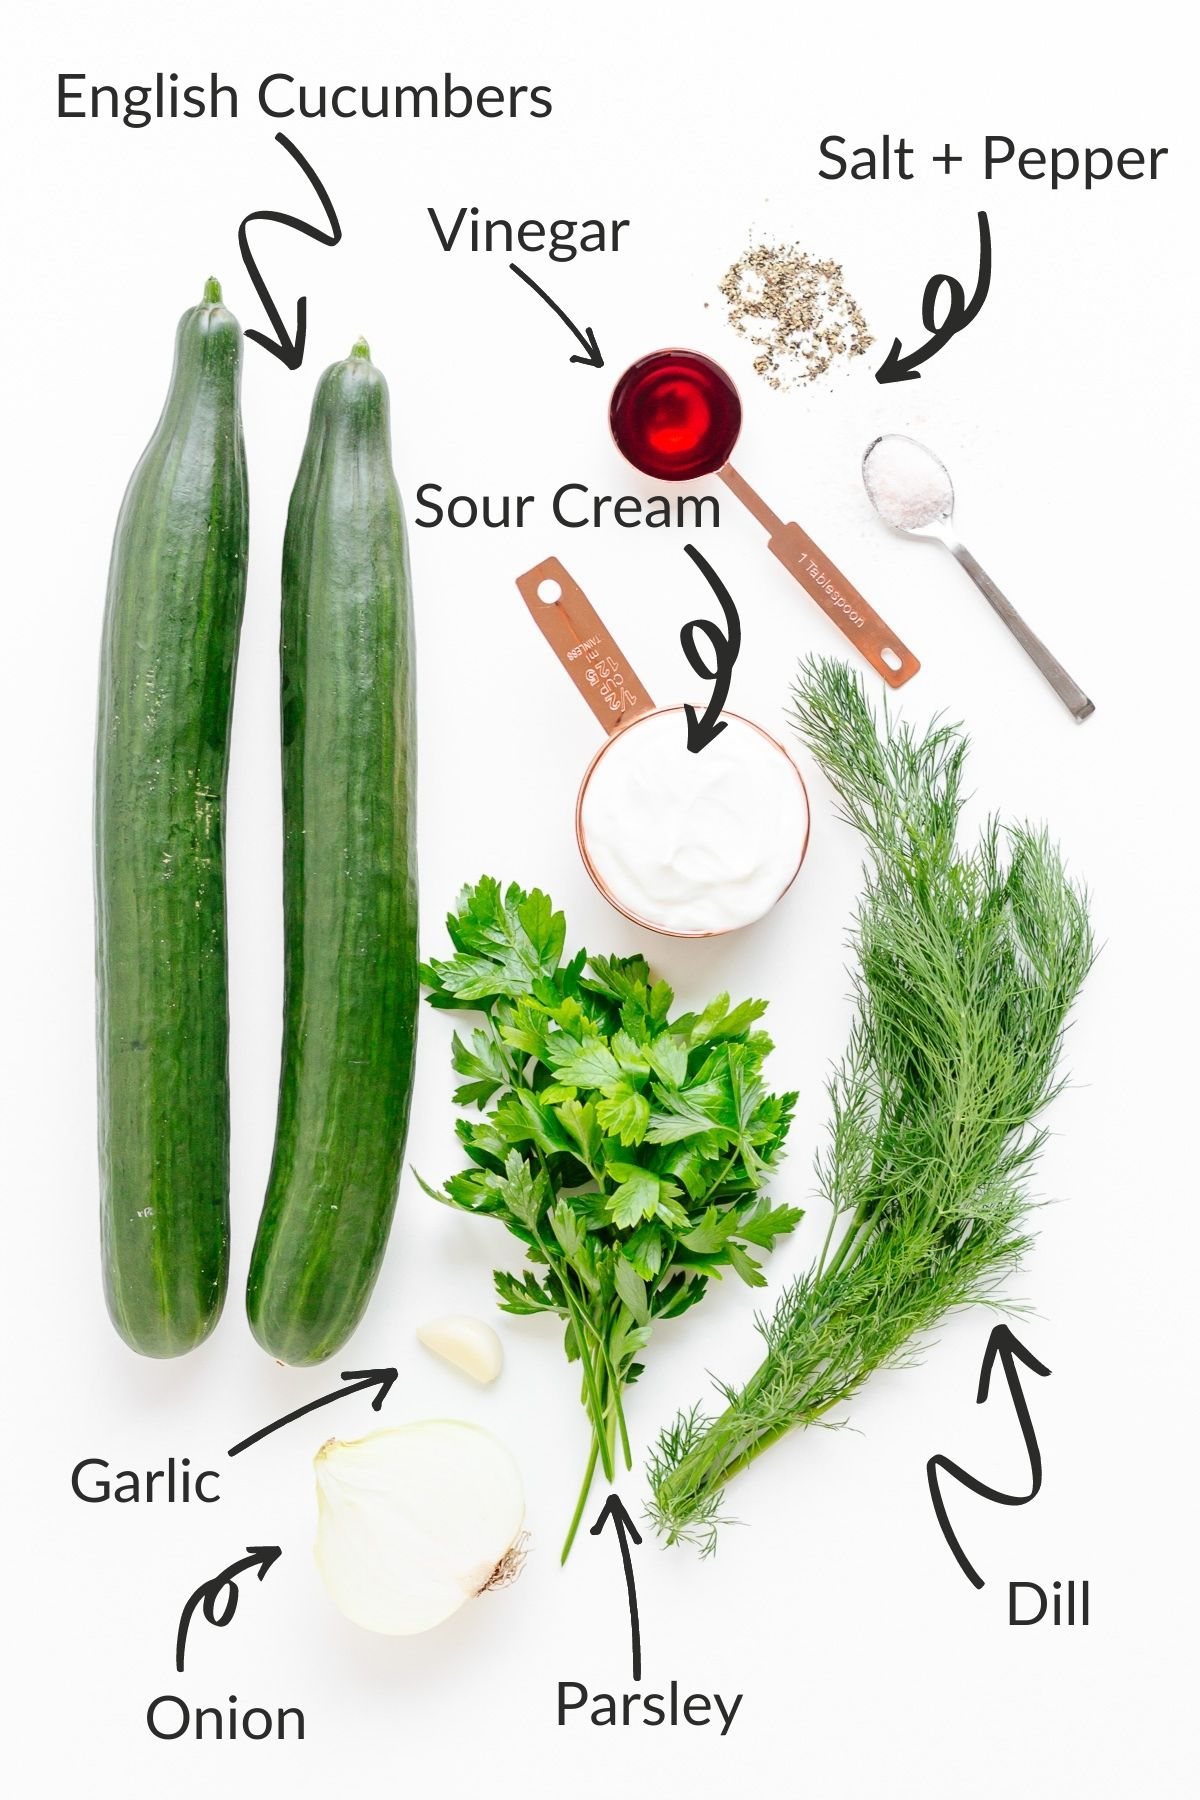 Labelled photo of ingredients needed to make German cucumber salad (Gurkensalat).